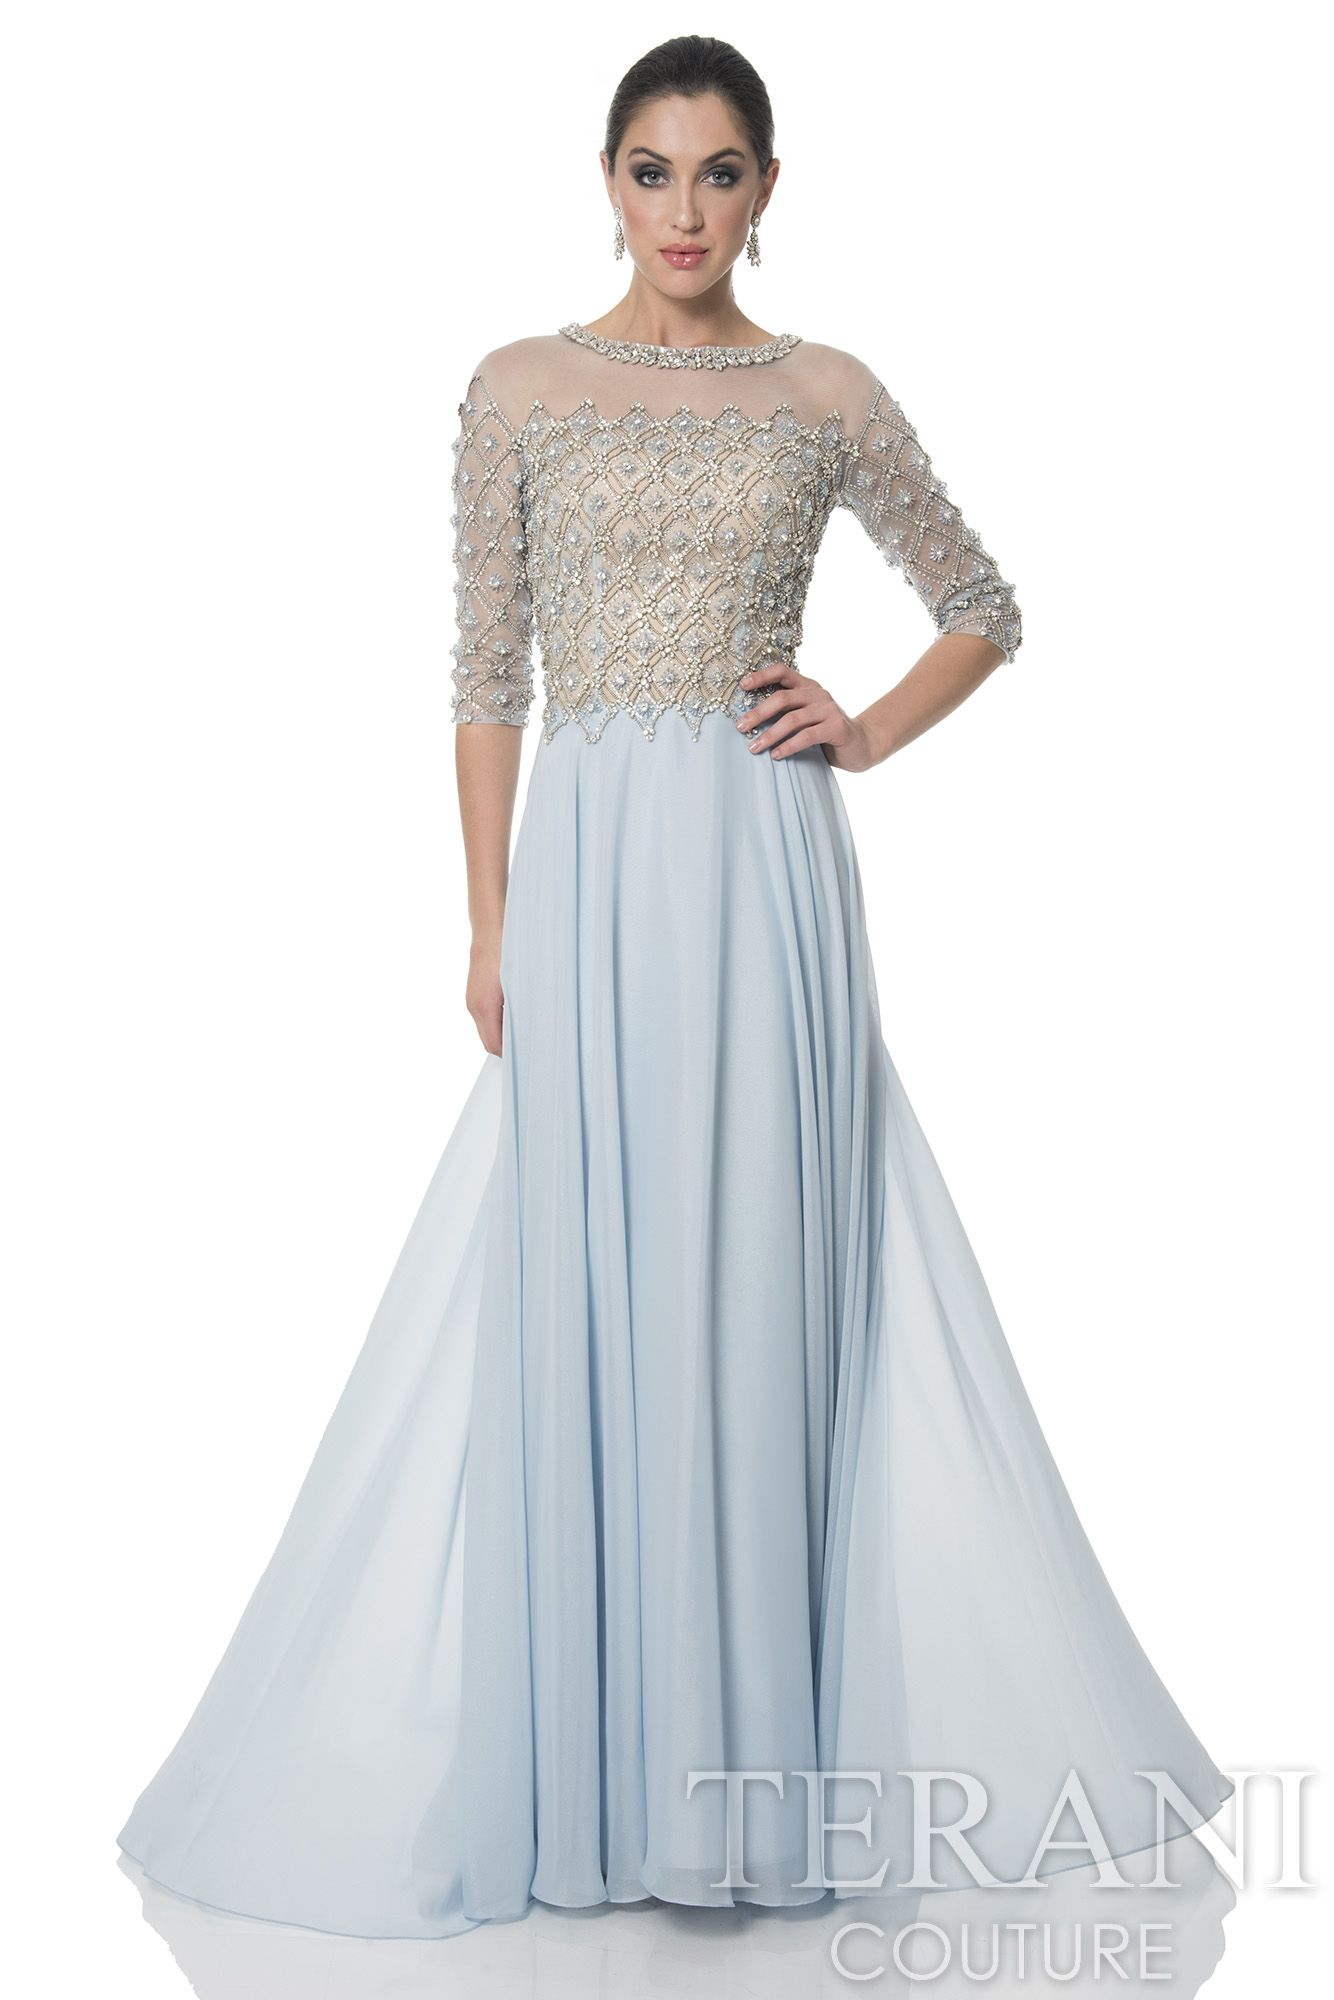 MOTHERS | Wedding guest attire | Pinterest | Wedding guest attire ...